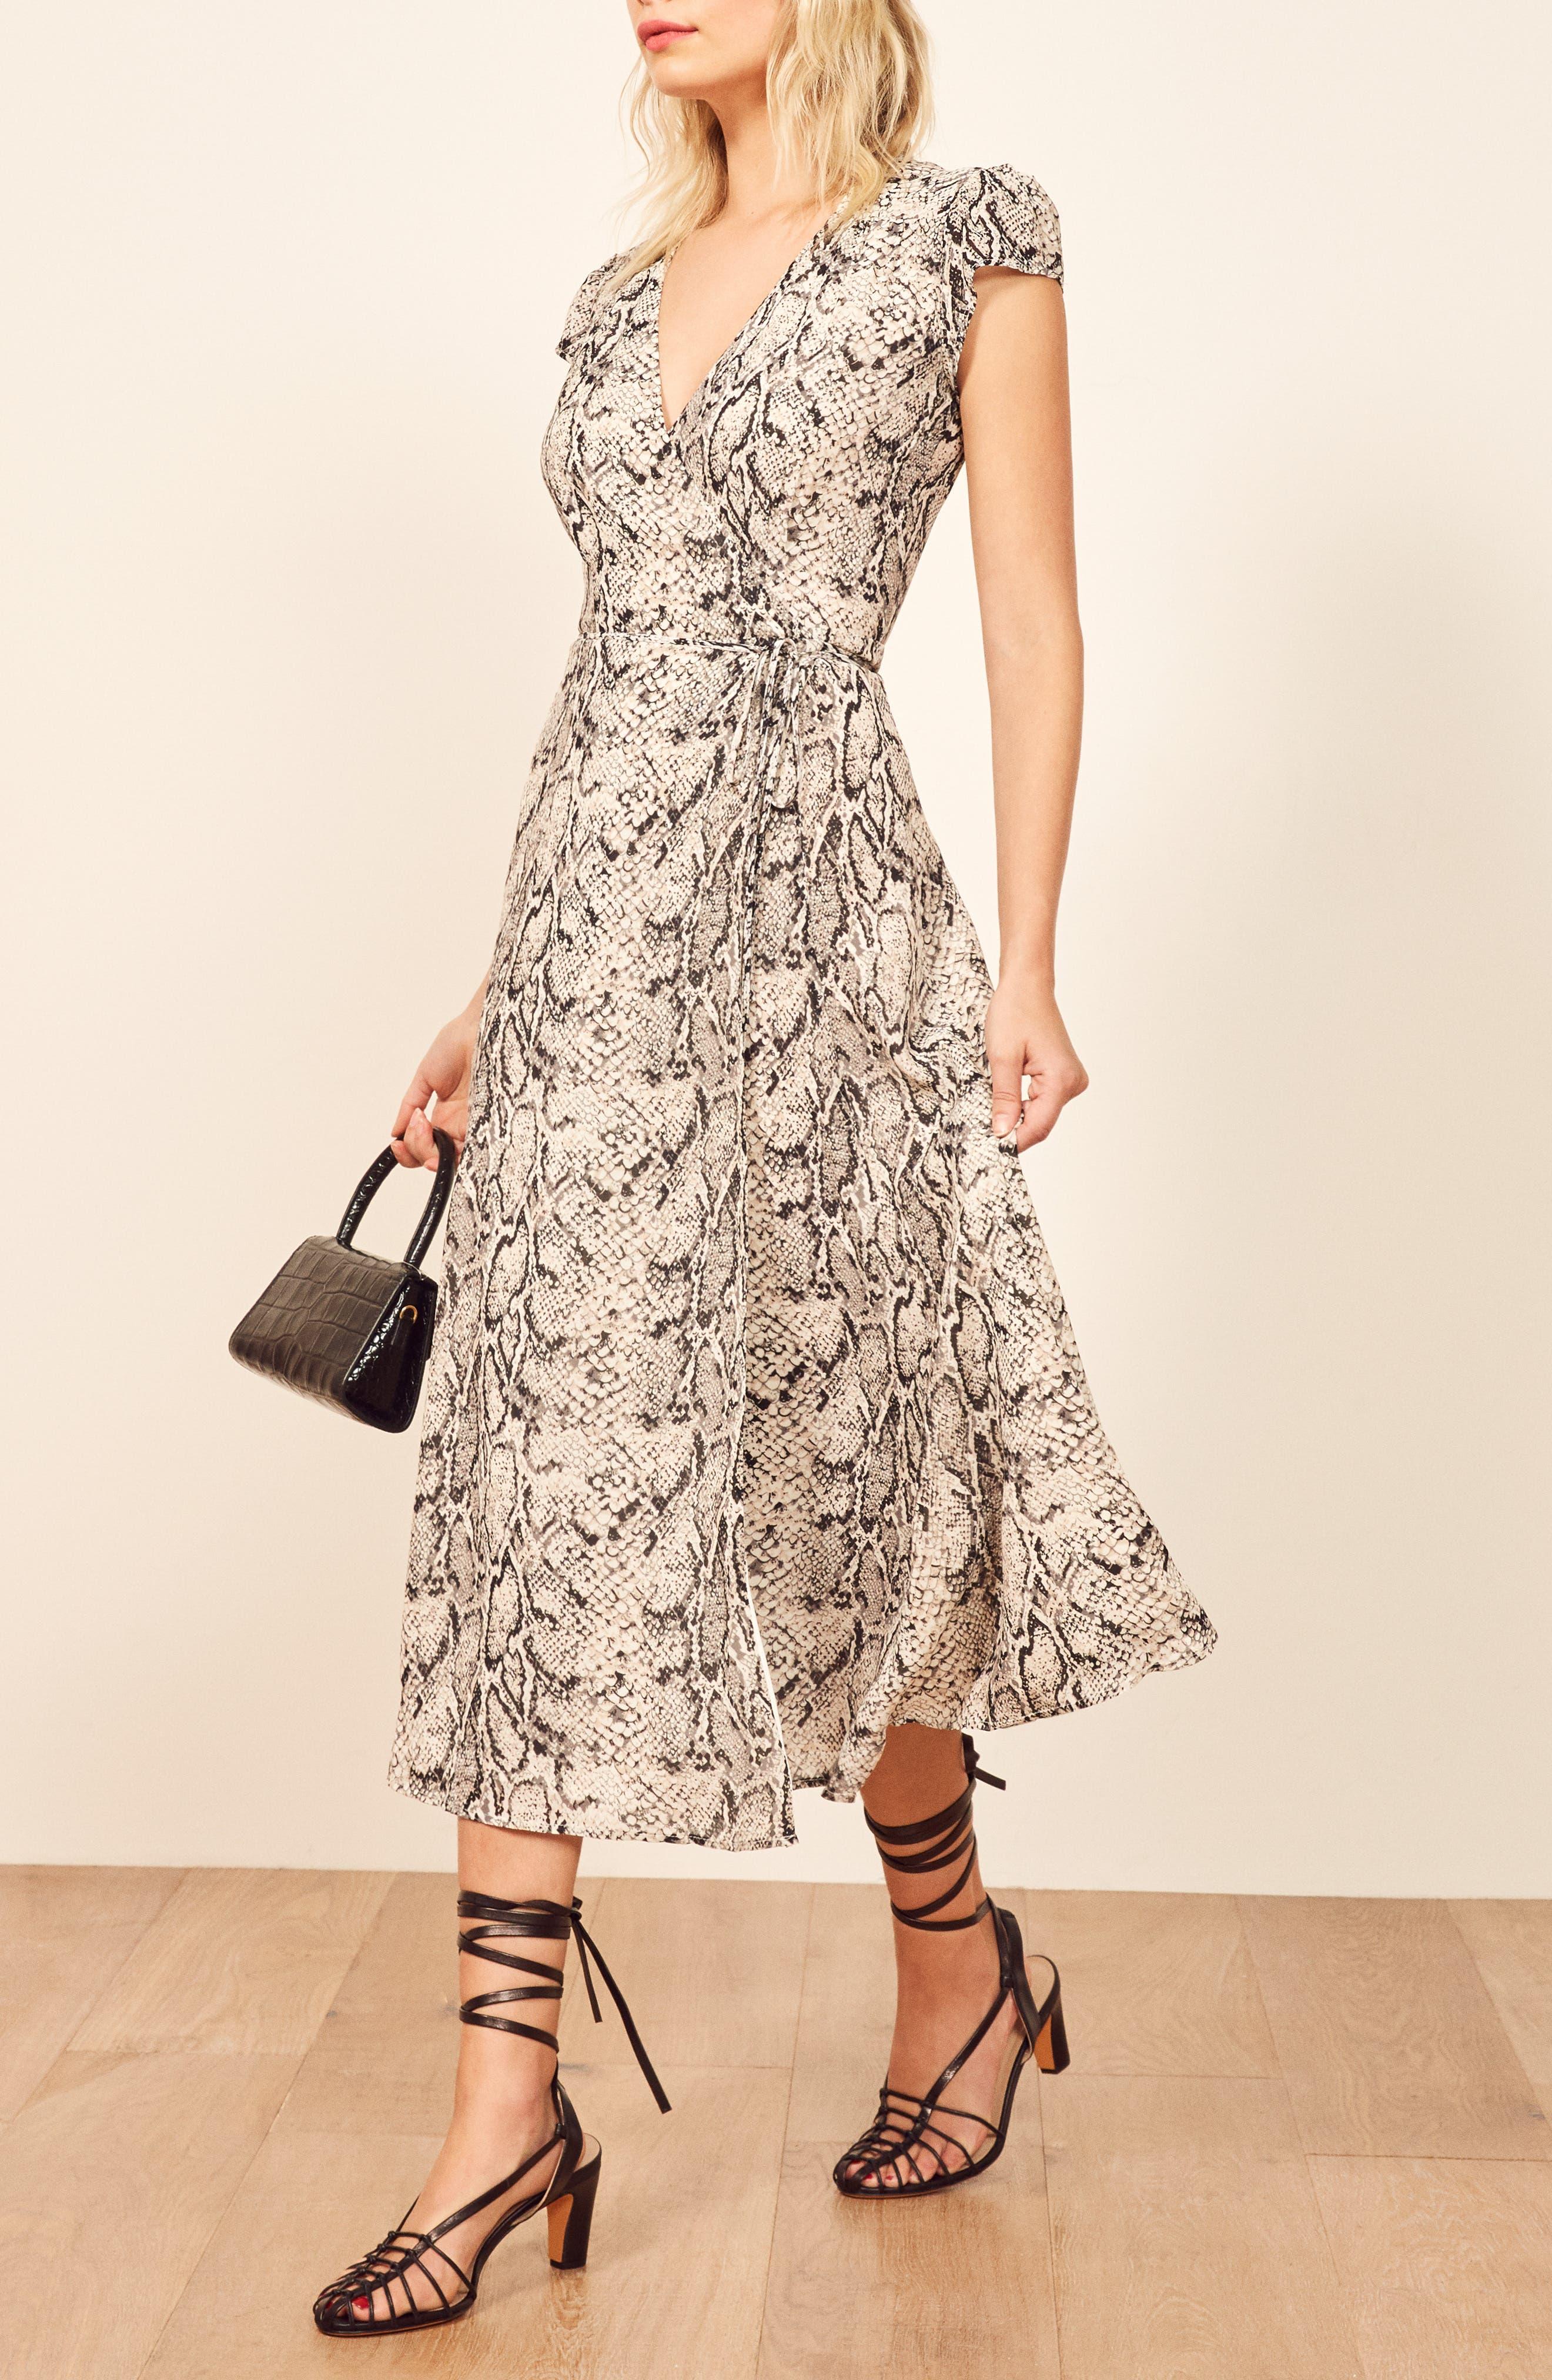 REFORMATION, Carina Midi Wrap Dress, Alternate thumbnail 5, color, RATTLESNAKE